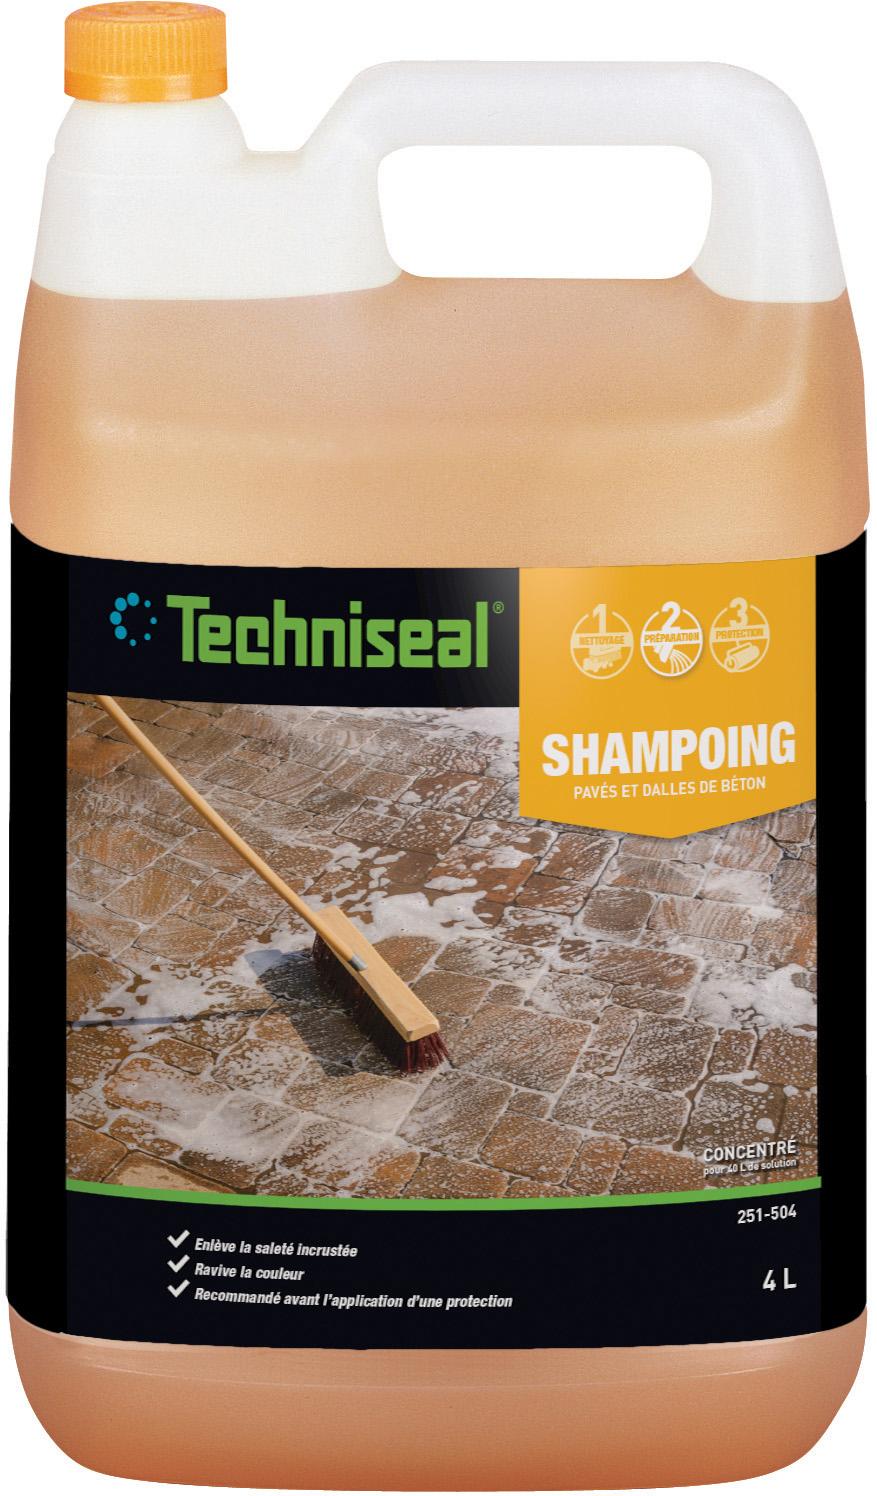 17721_TECHNISEAL-ShampoingSmartCare